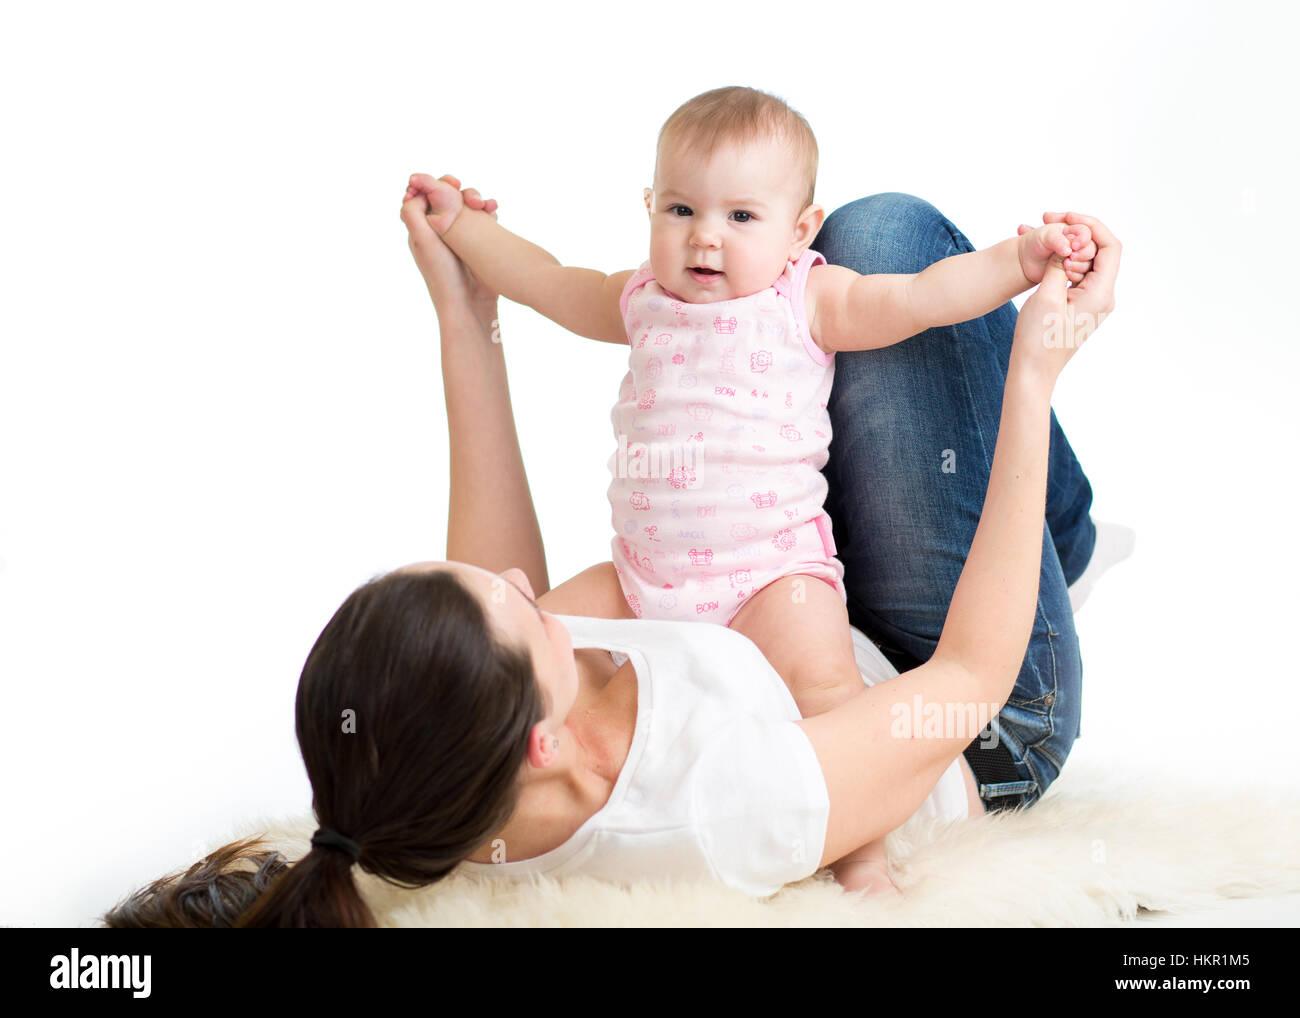 Mother and baby gymnastics, yoga exercises - Stock Image